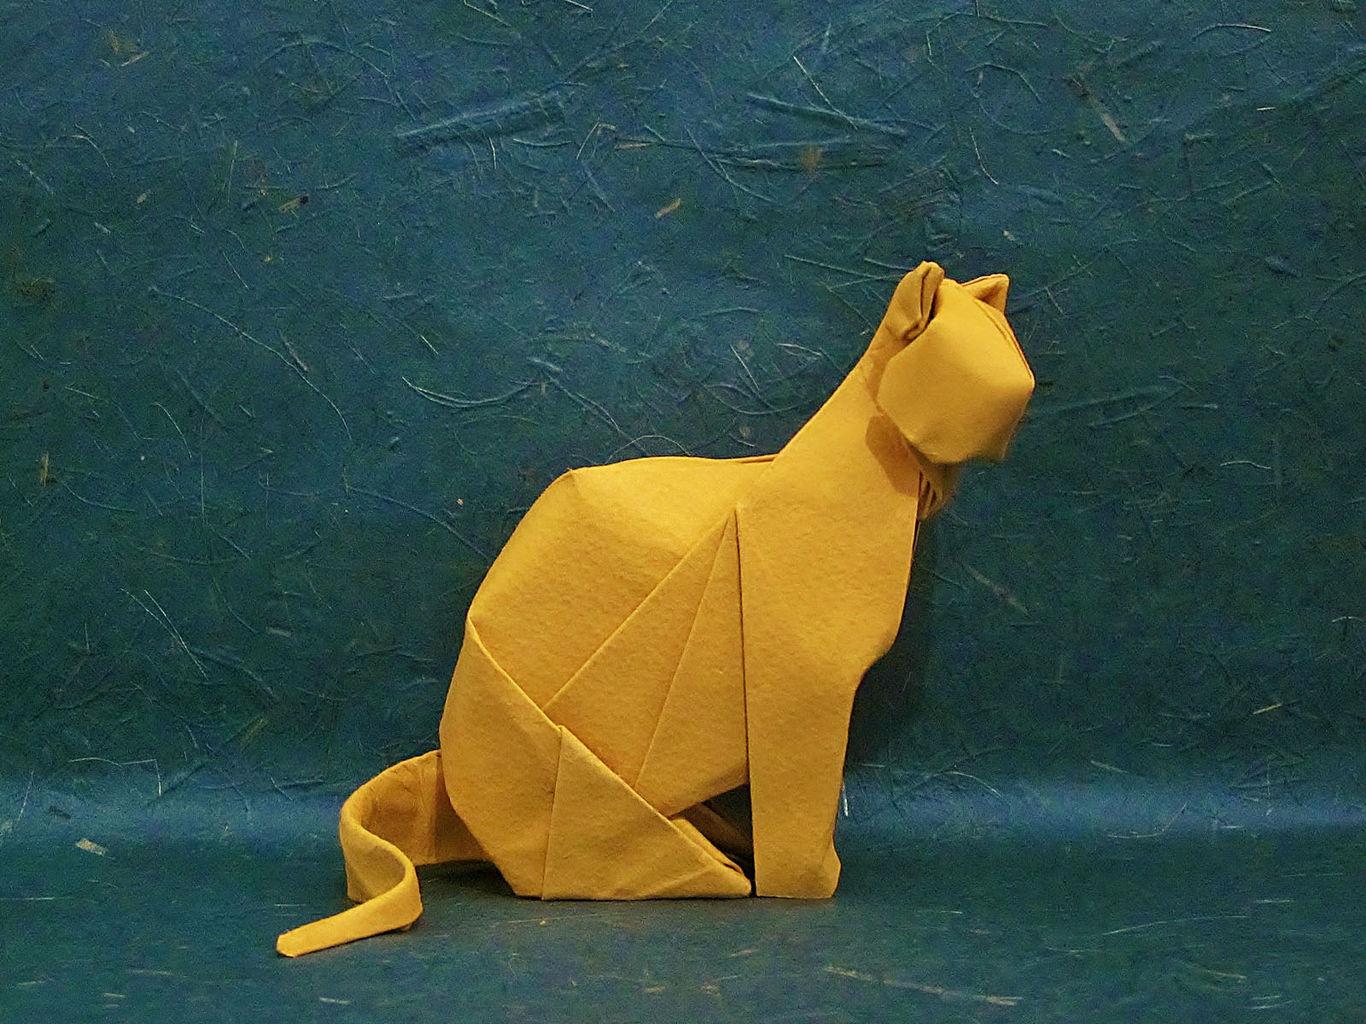 Decoracion Origami Bogota ~ en origami, decoraci?n en origami, origami en Bogot?, origami